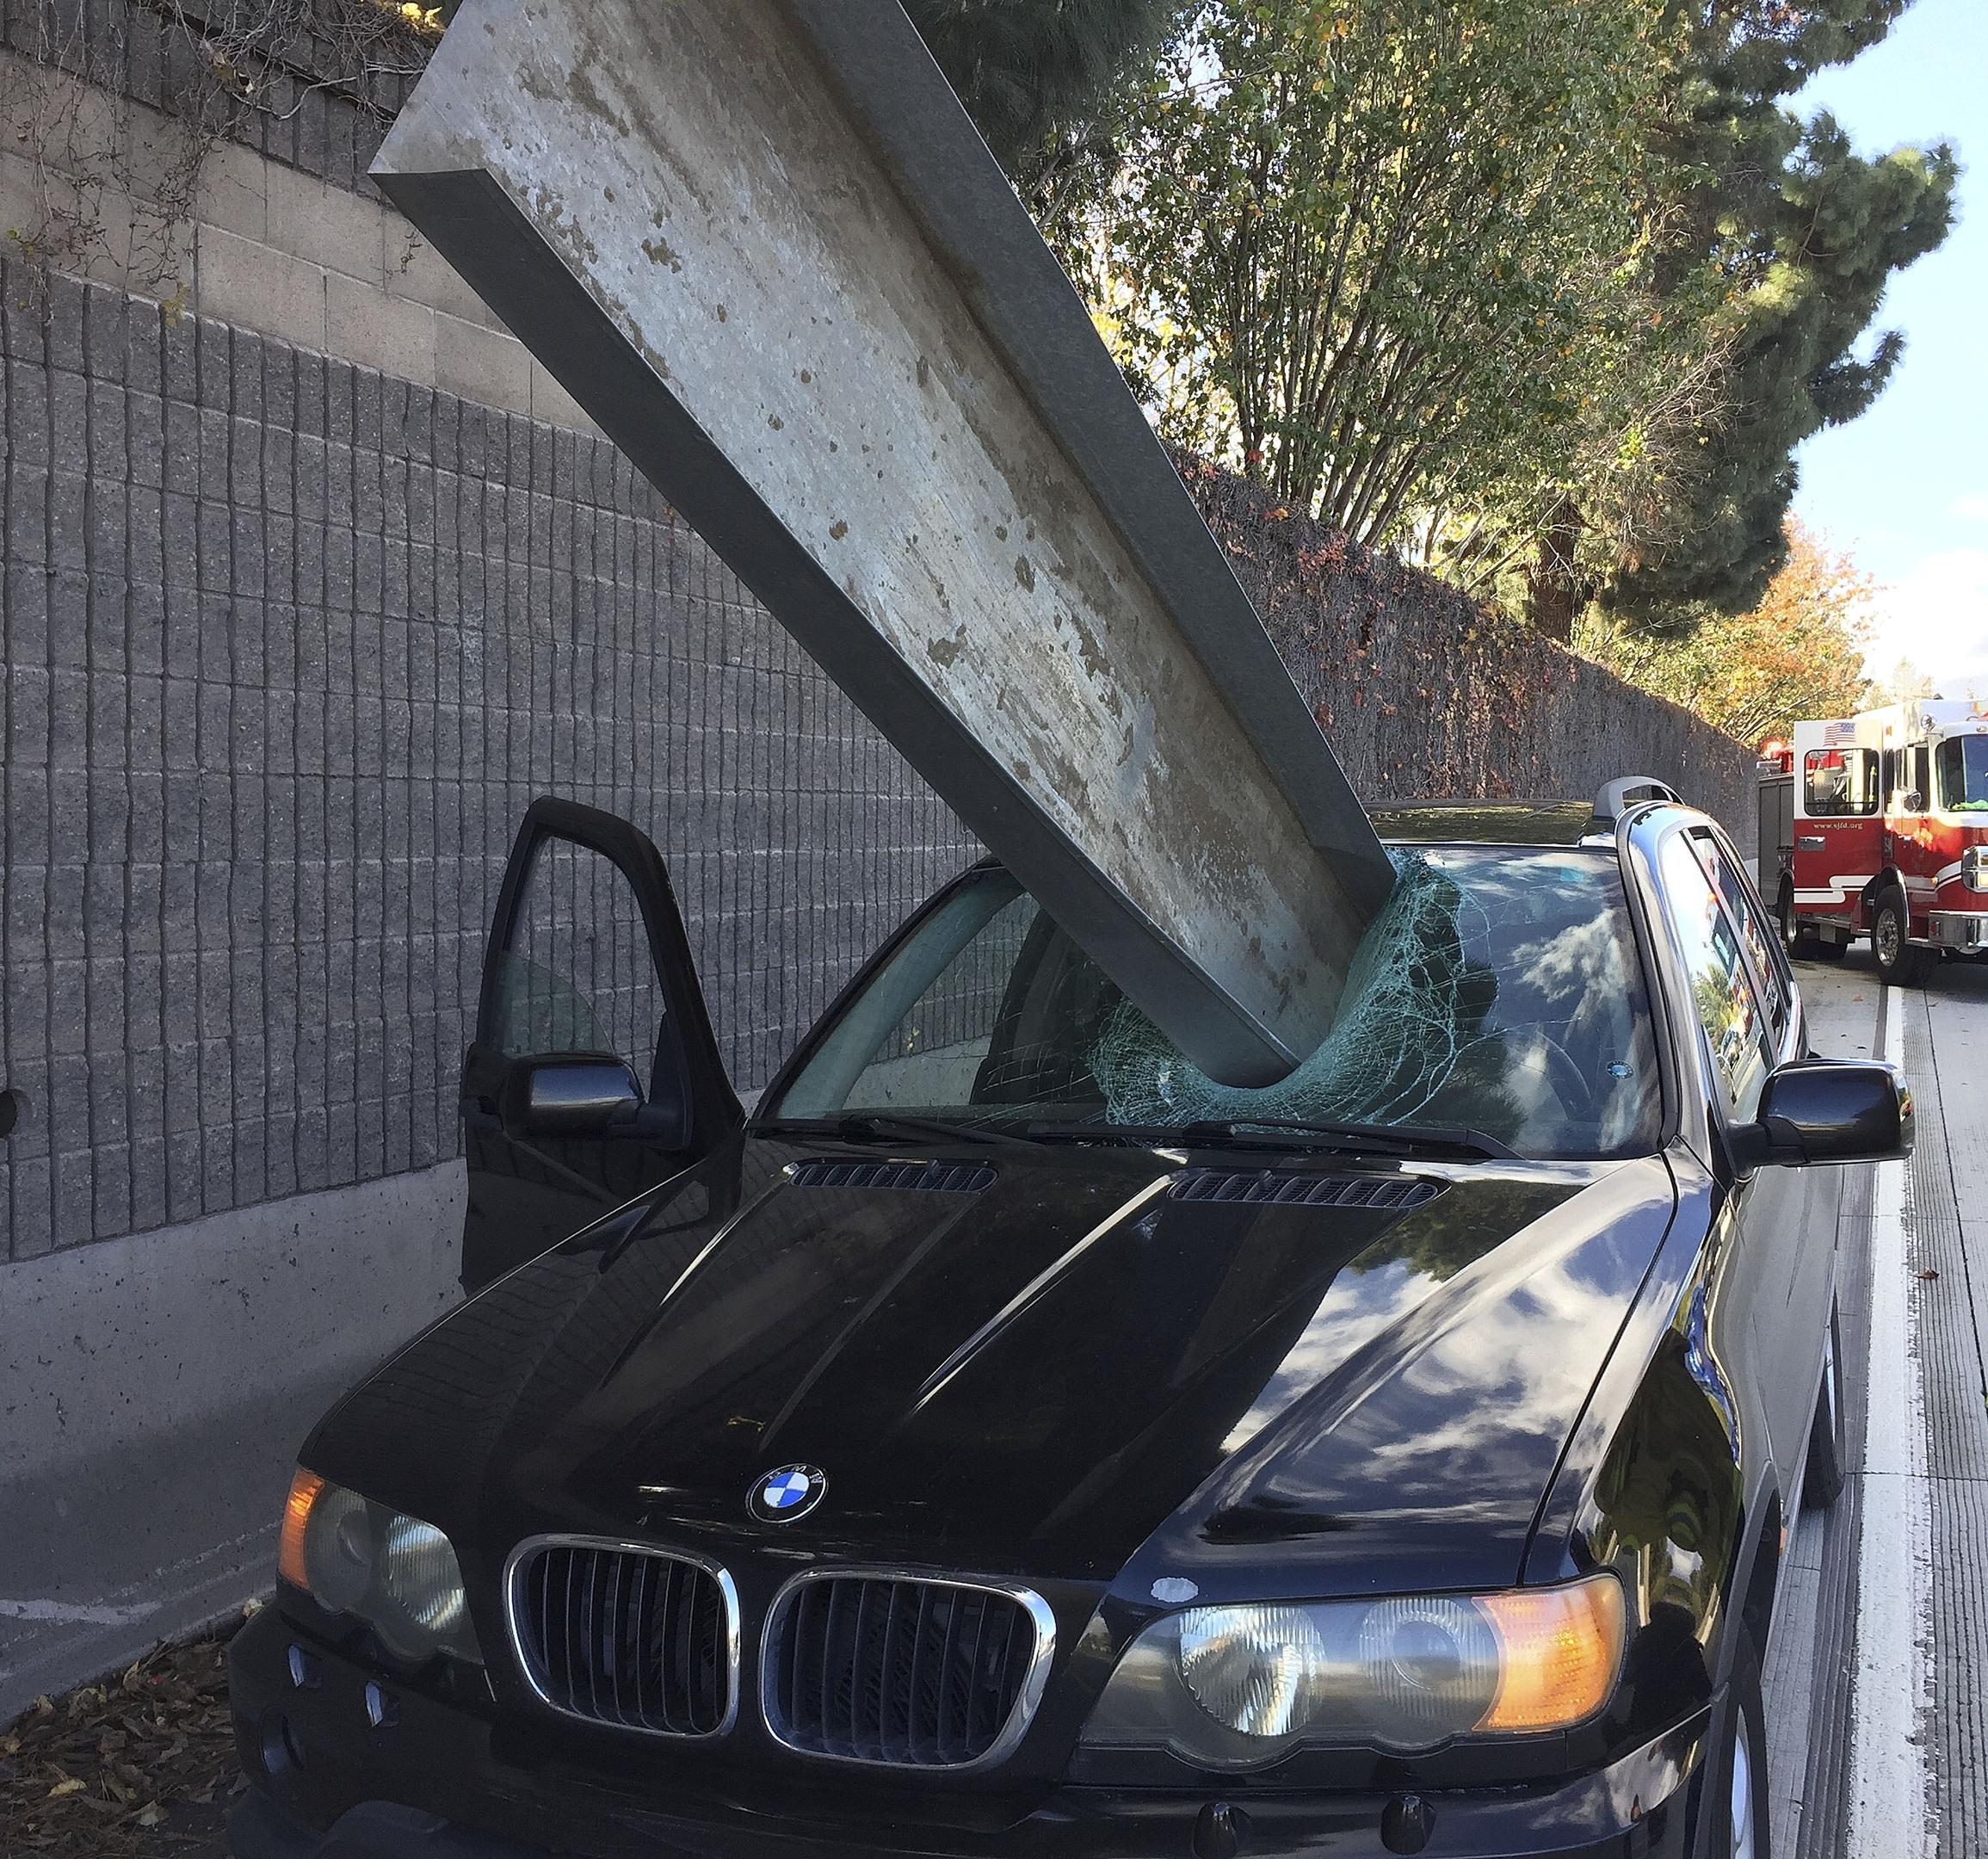 Don Lee's BMW impaled